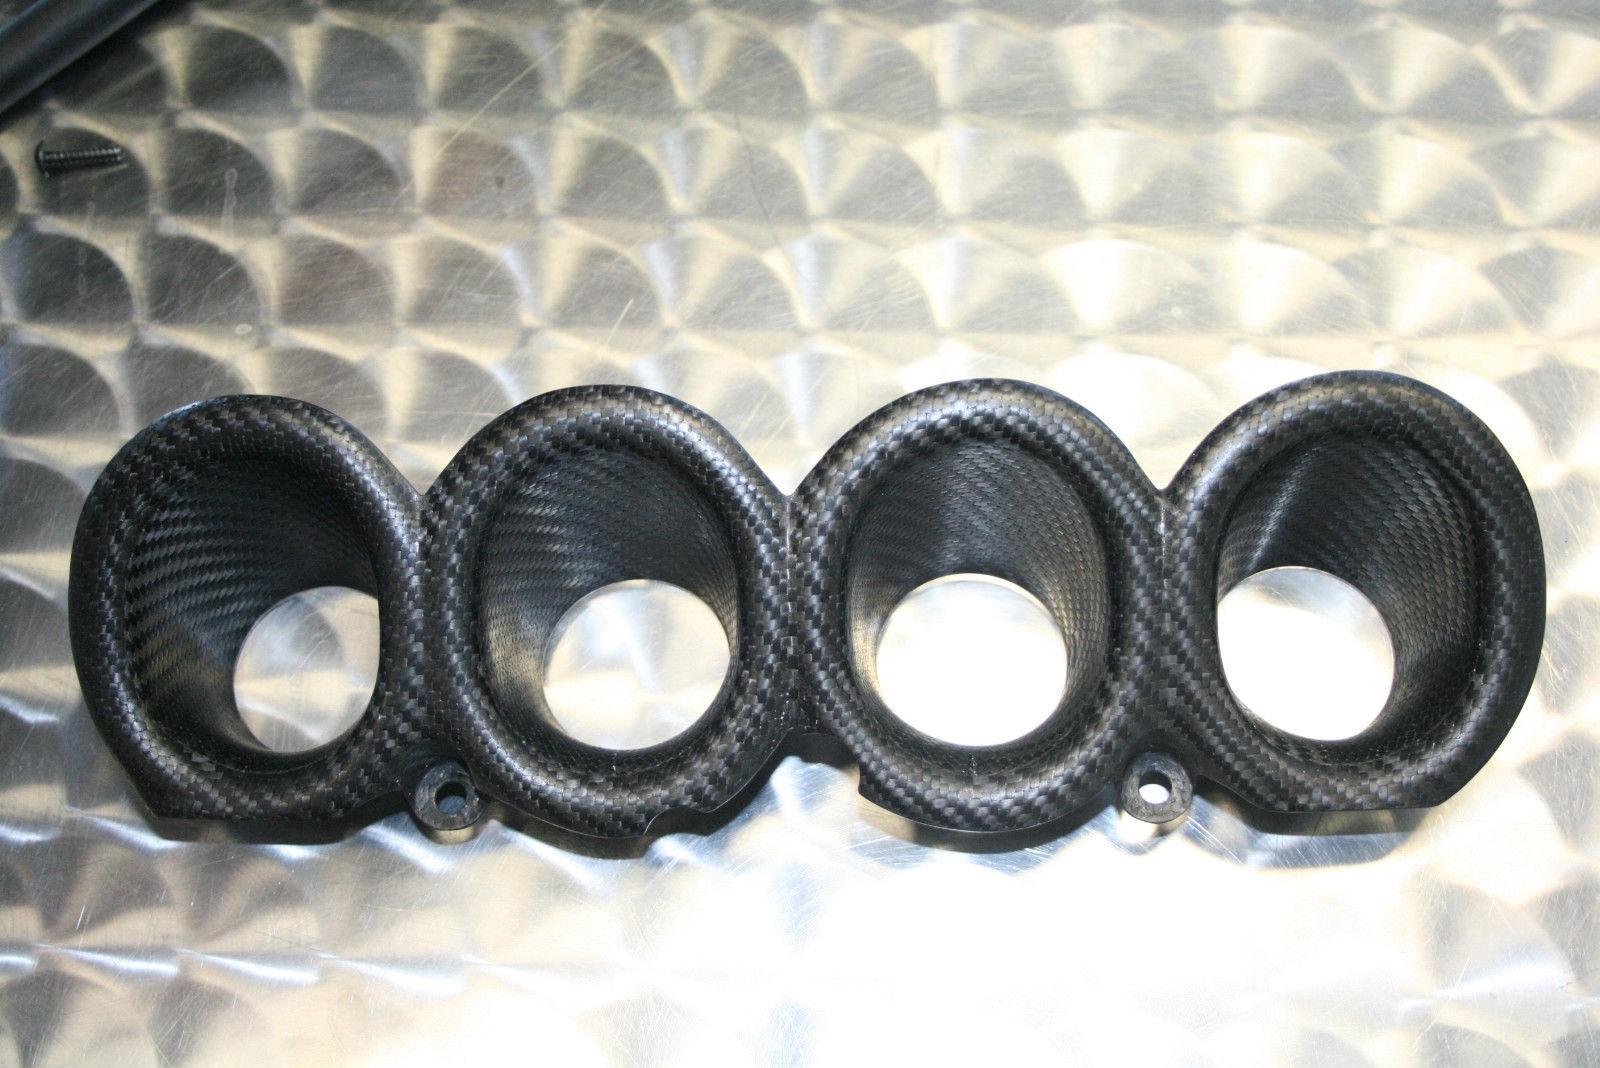 2007-16 Honda CBR600RR Carbon Fiber Velocity Stack / Bellmouth Kit - MotoMaxx